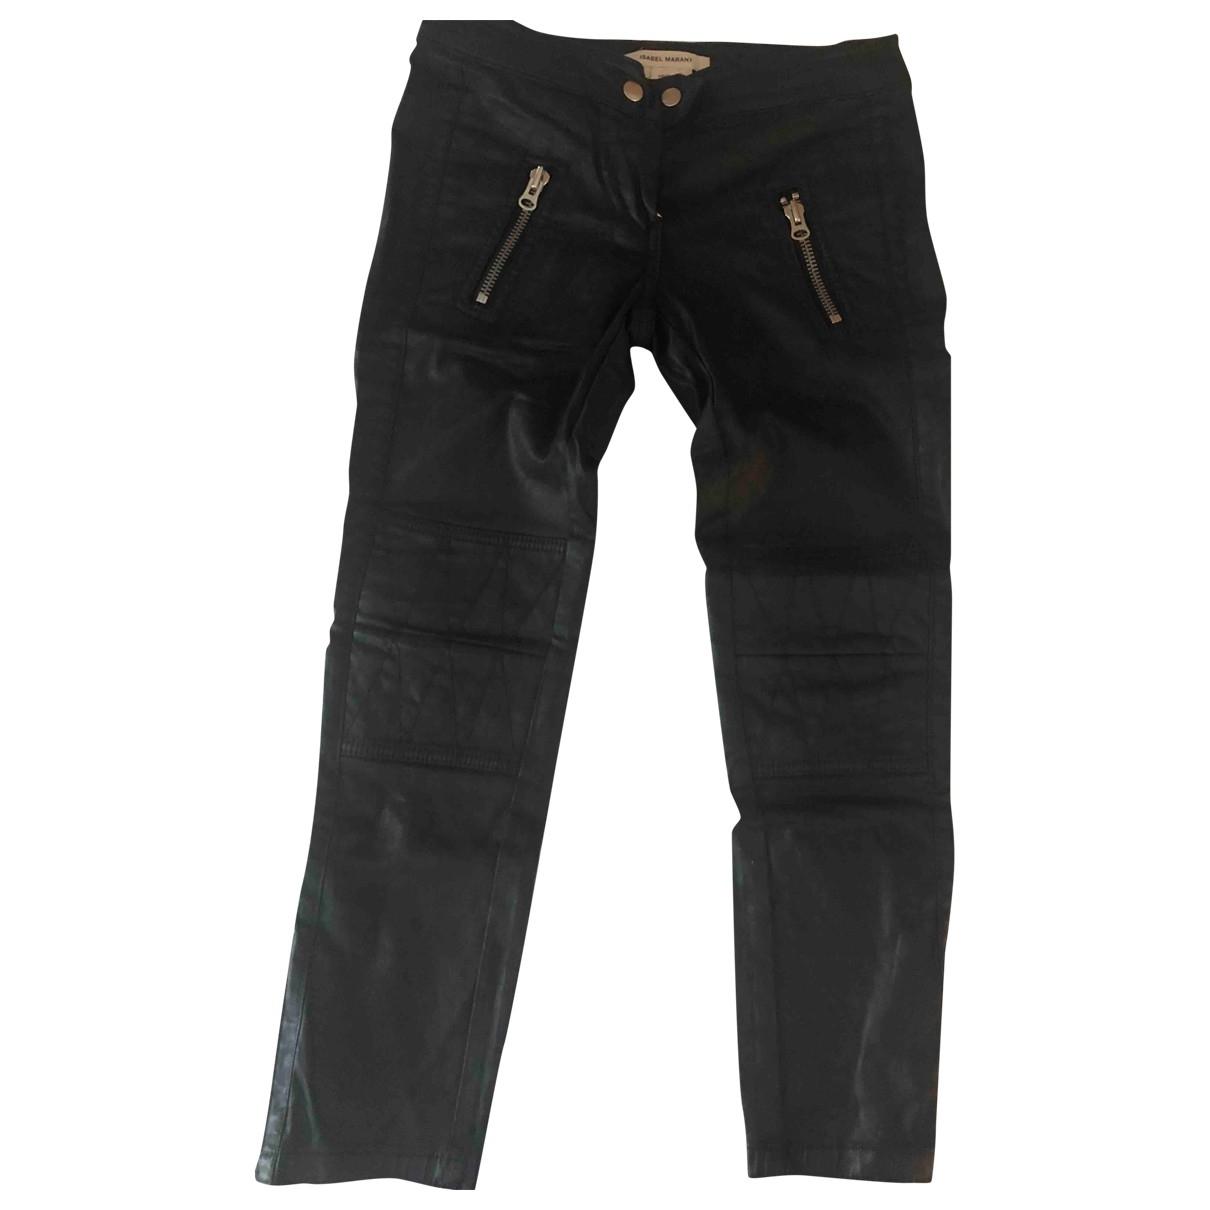 Isabel Marant \N Black Denim - Jeans Trousers for Women XS International